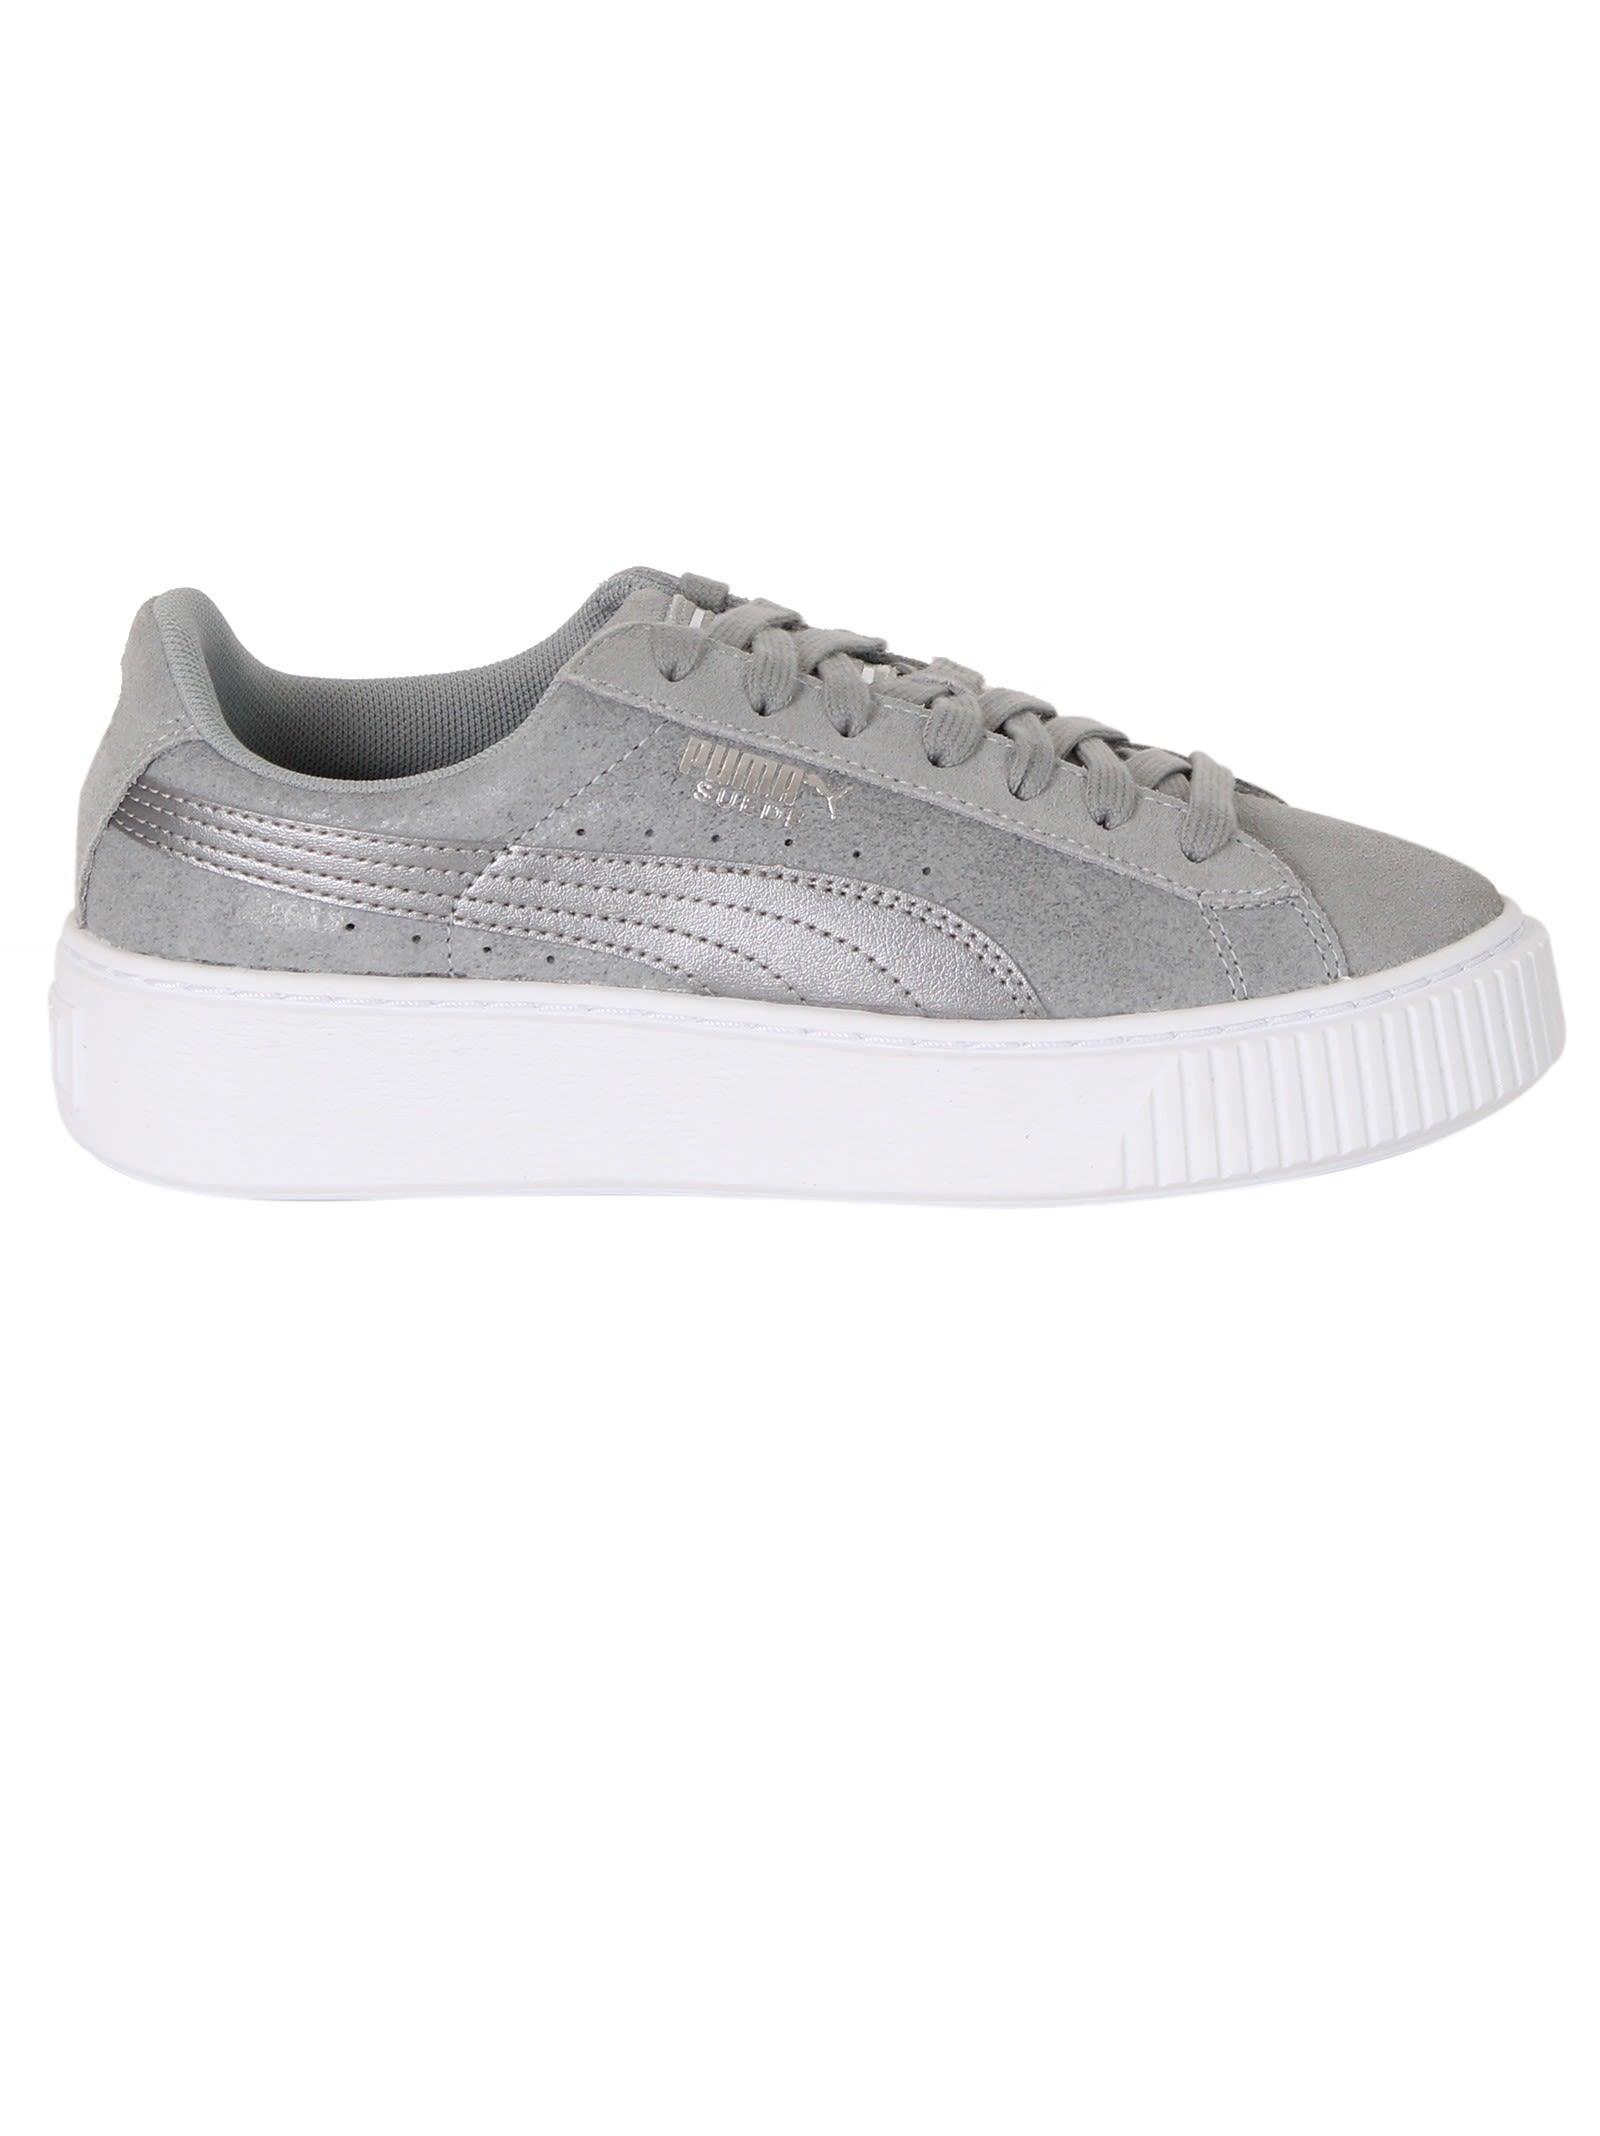 Quarry Suede Platform Sneakers